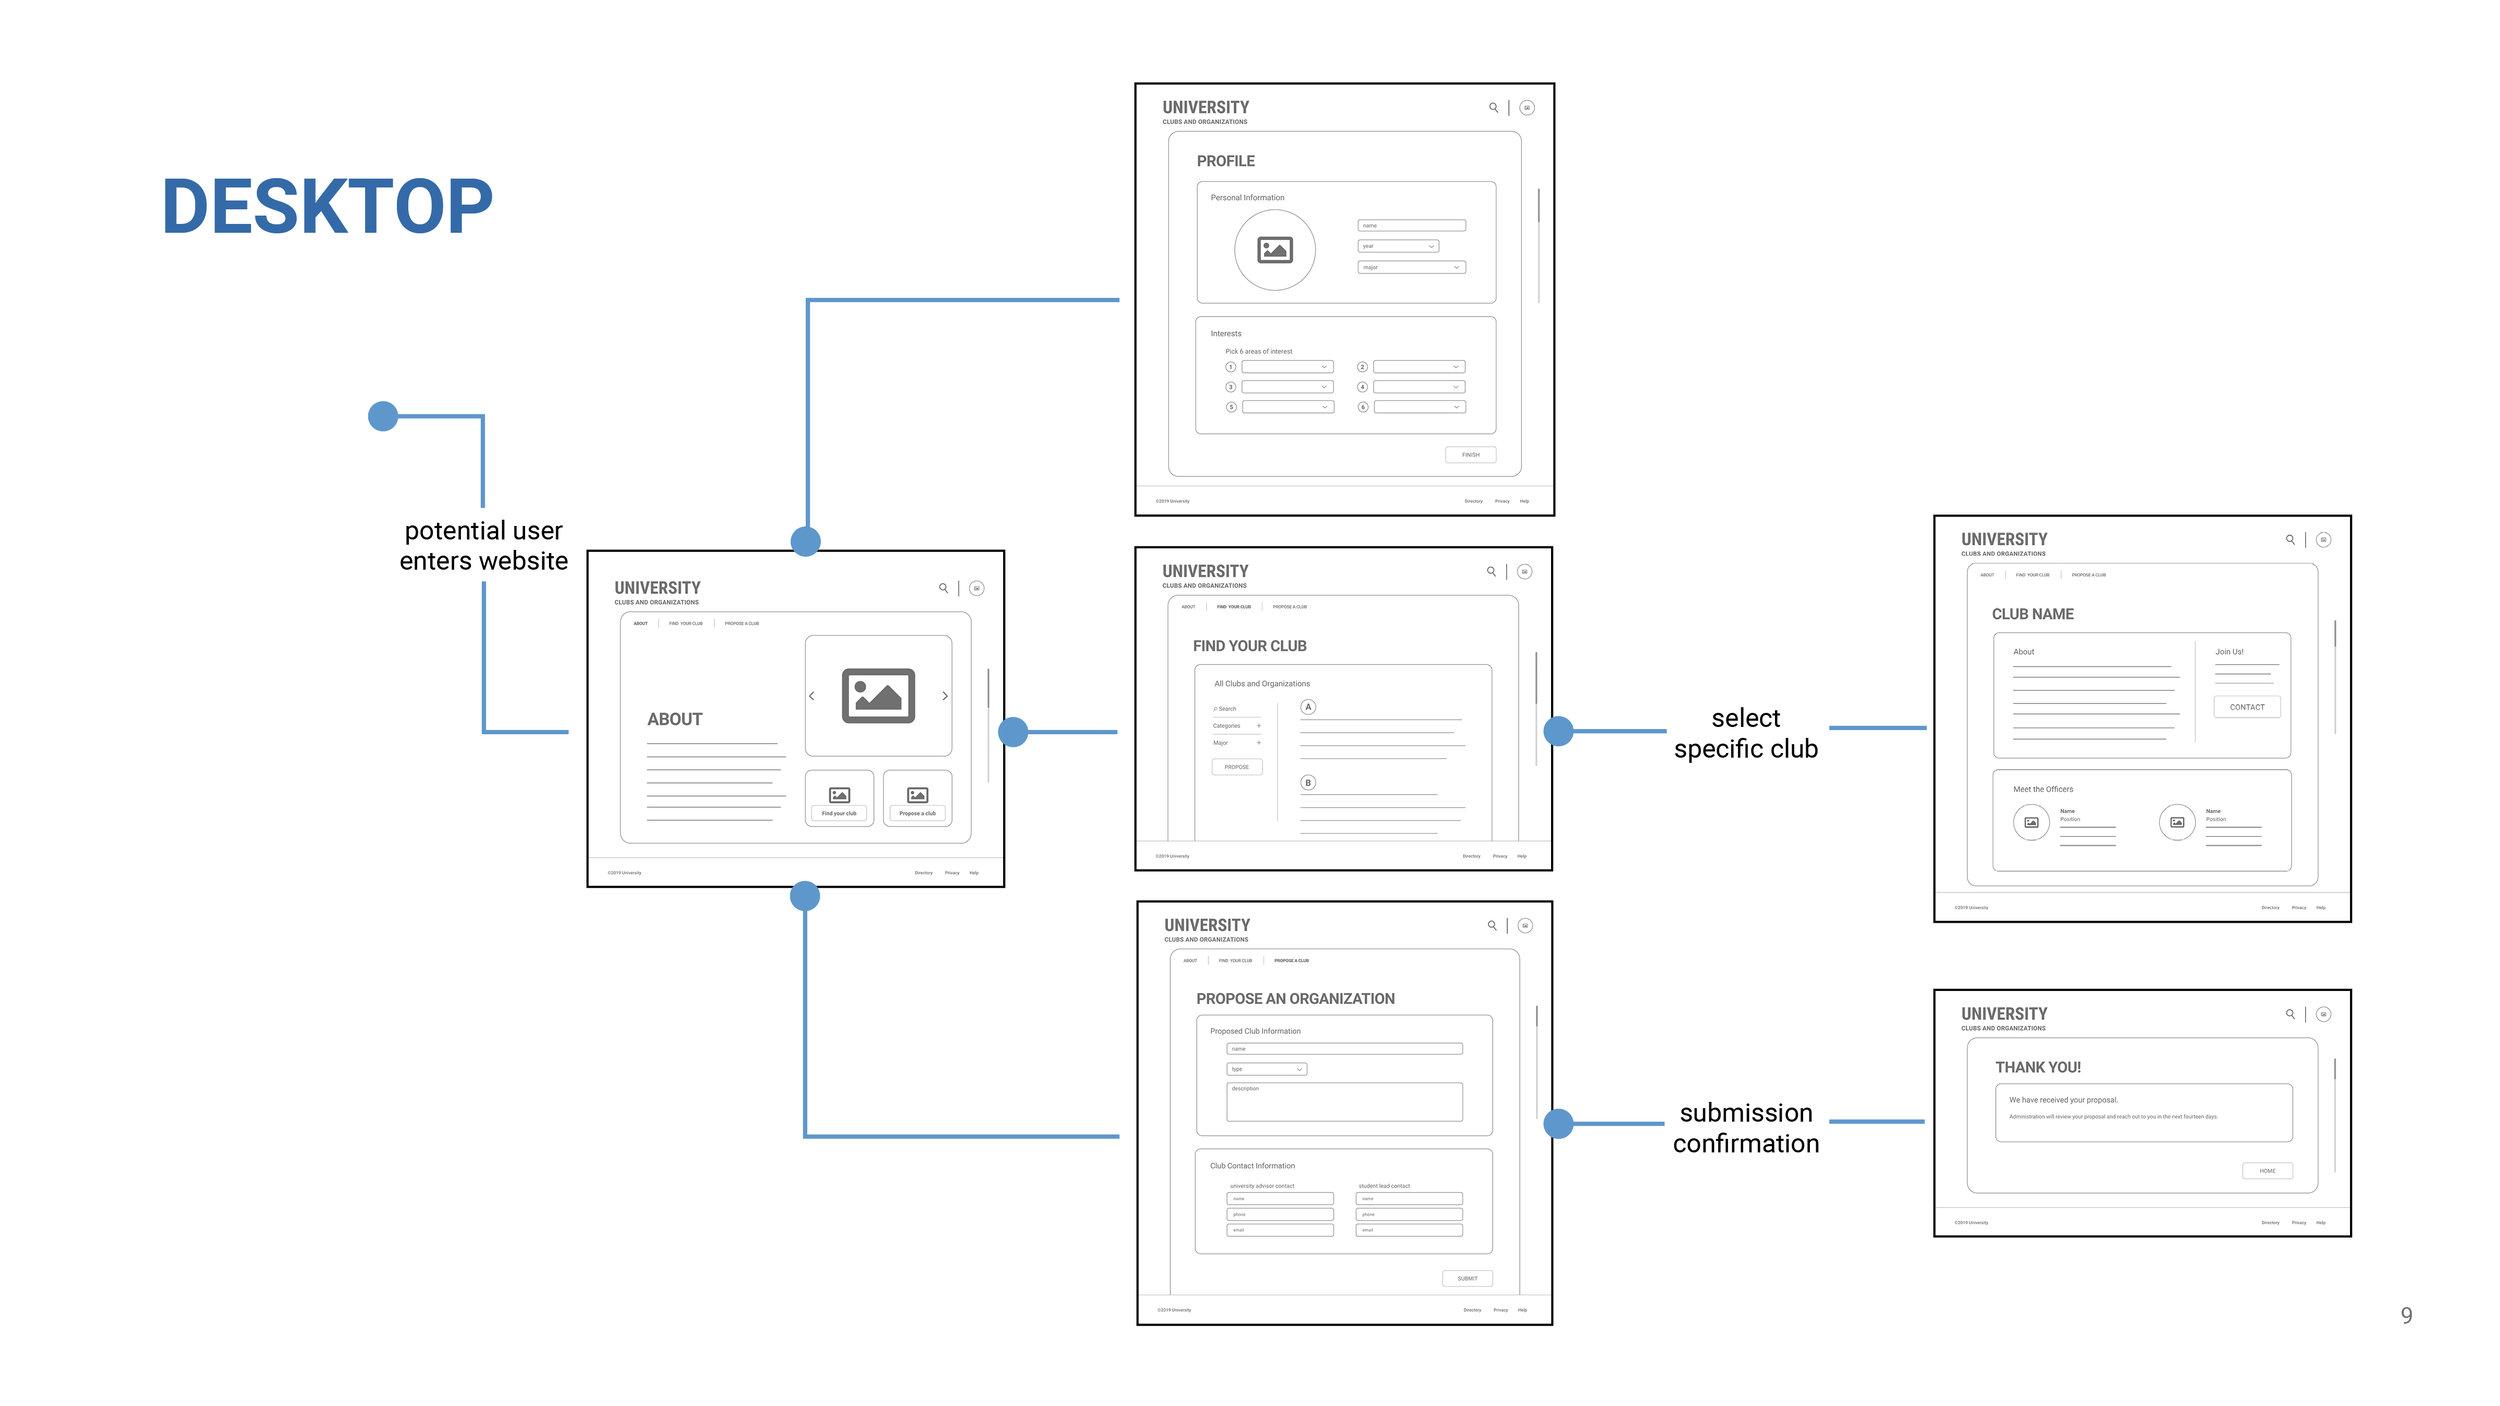 GoogleInternship_designExercise_9.jpg